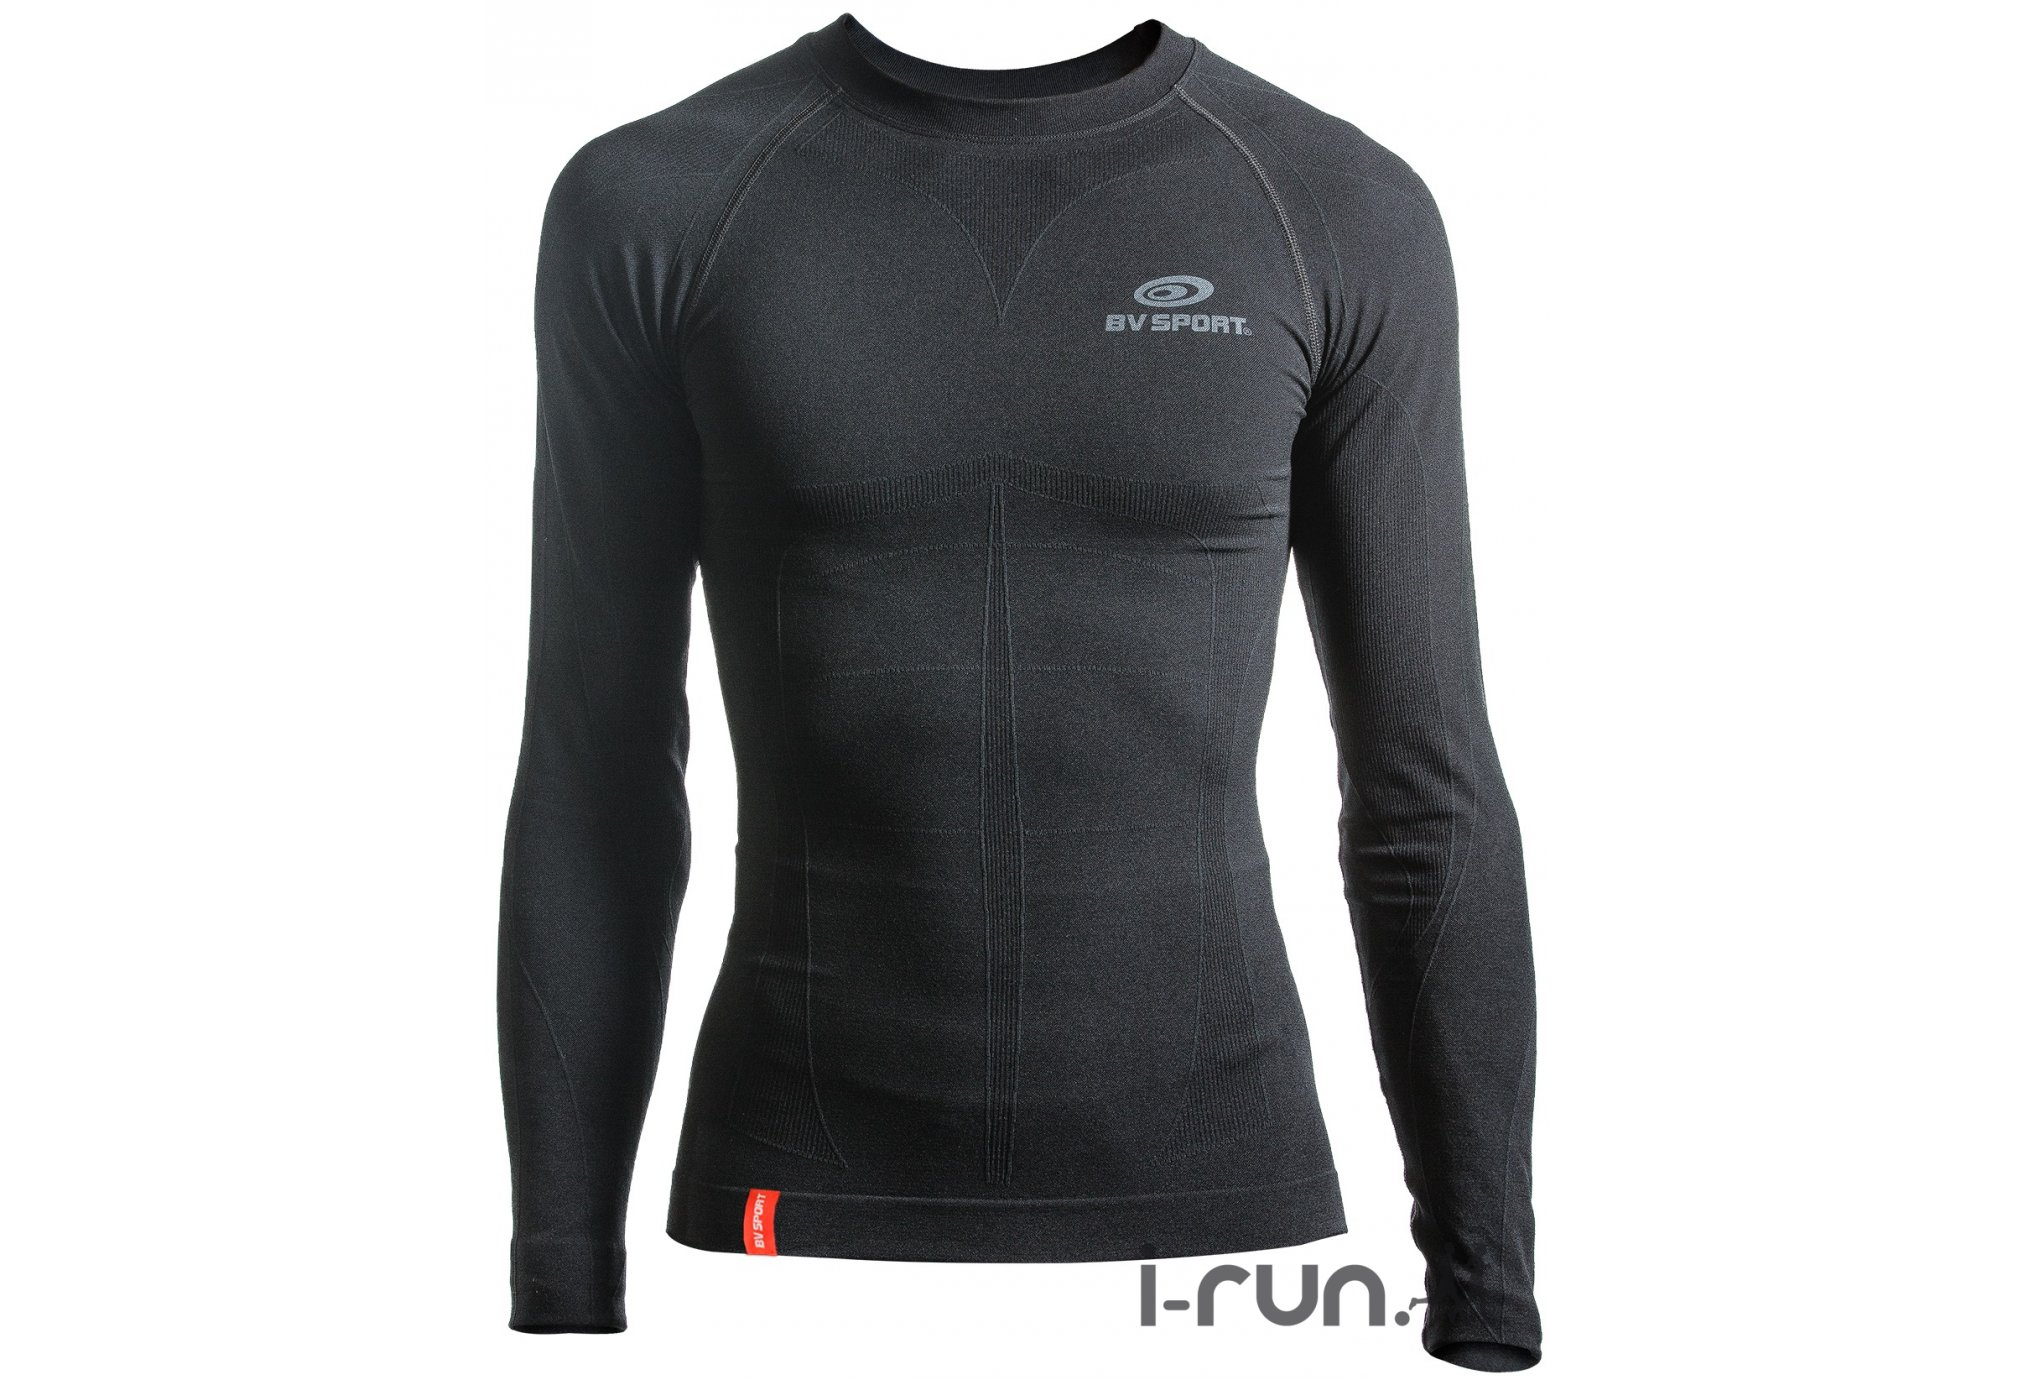 Bv Sport t-Shirt technique skael m vêtement running homme